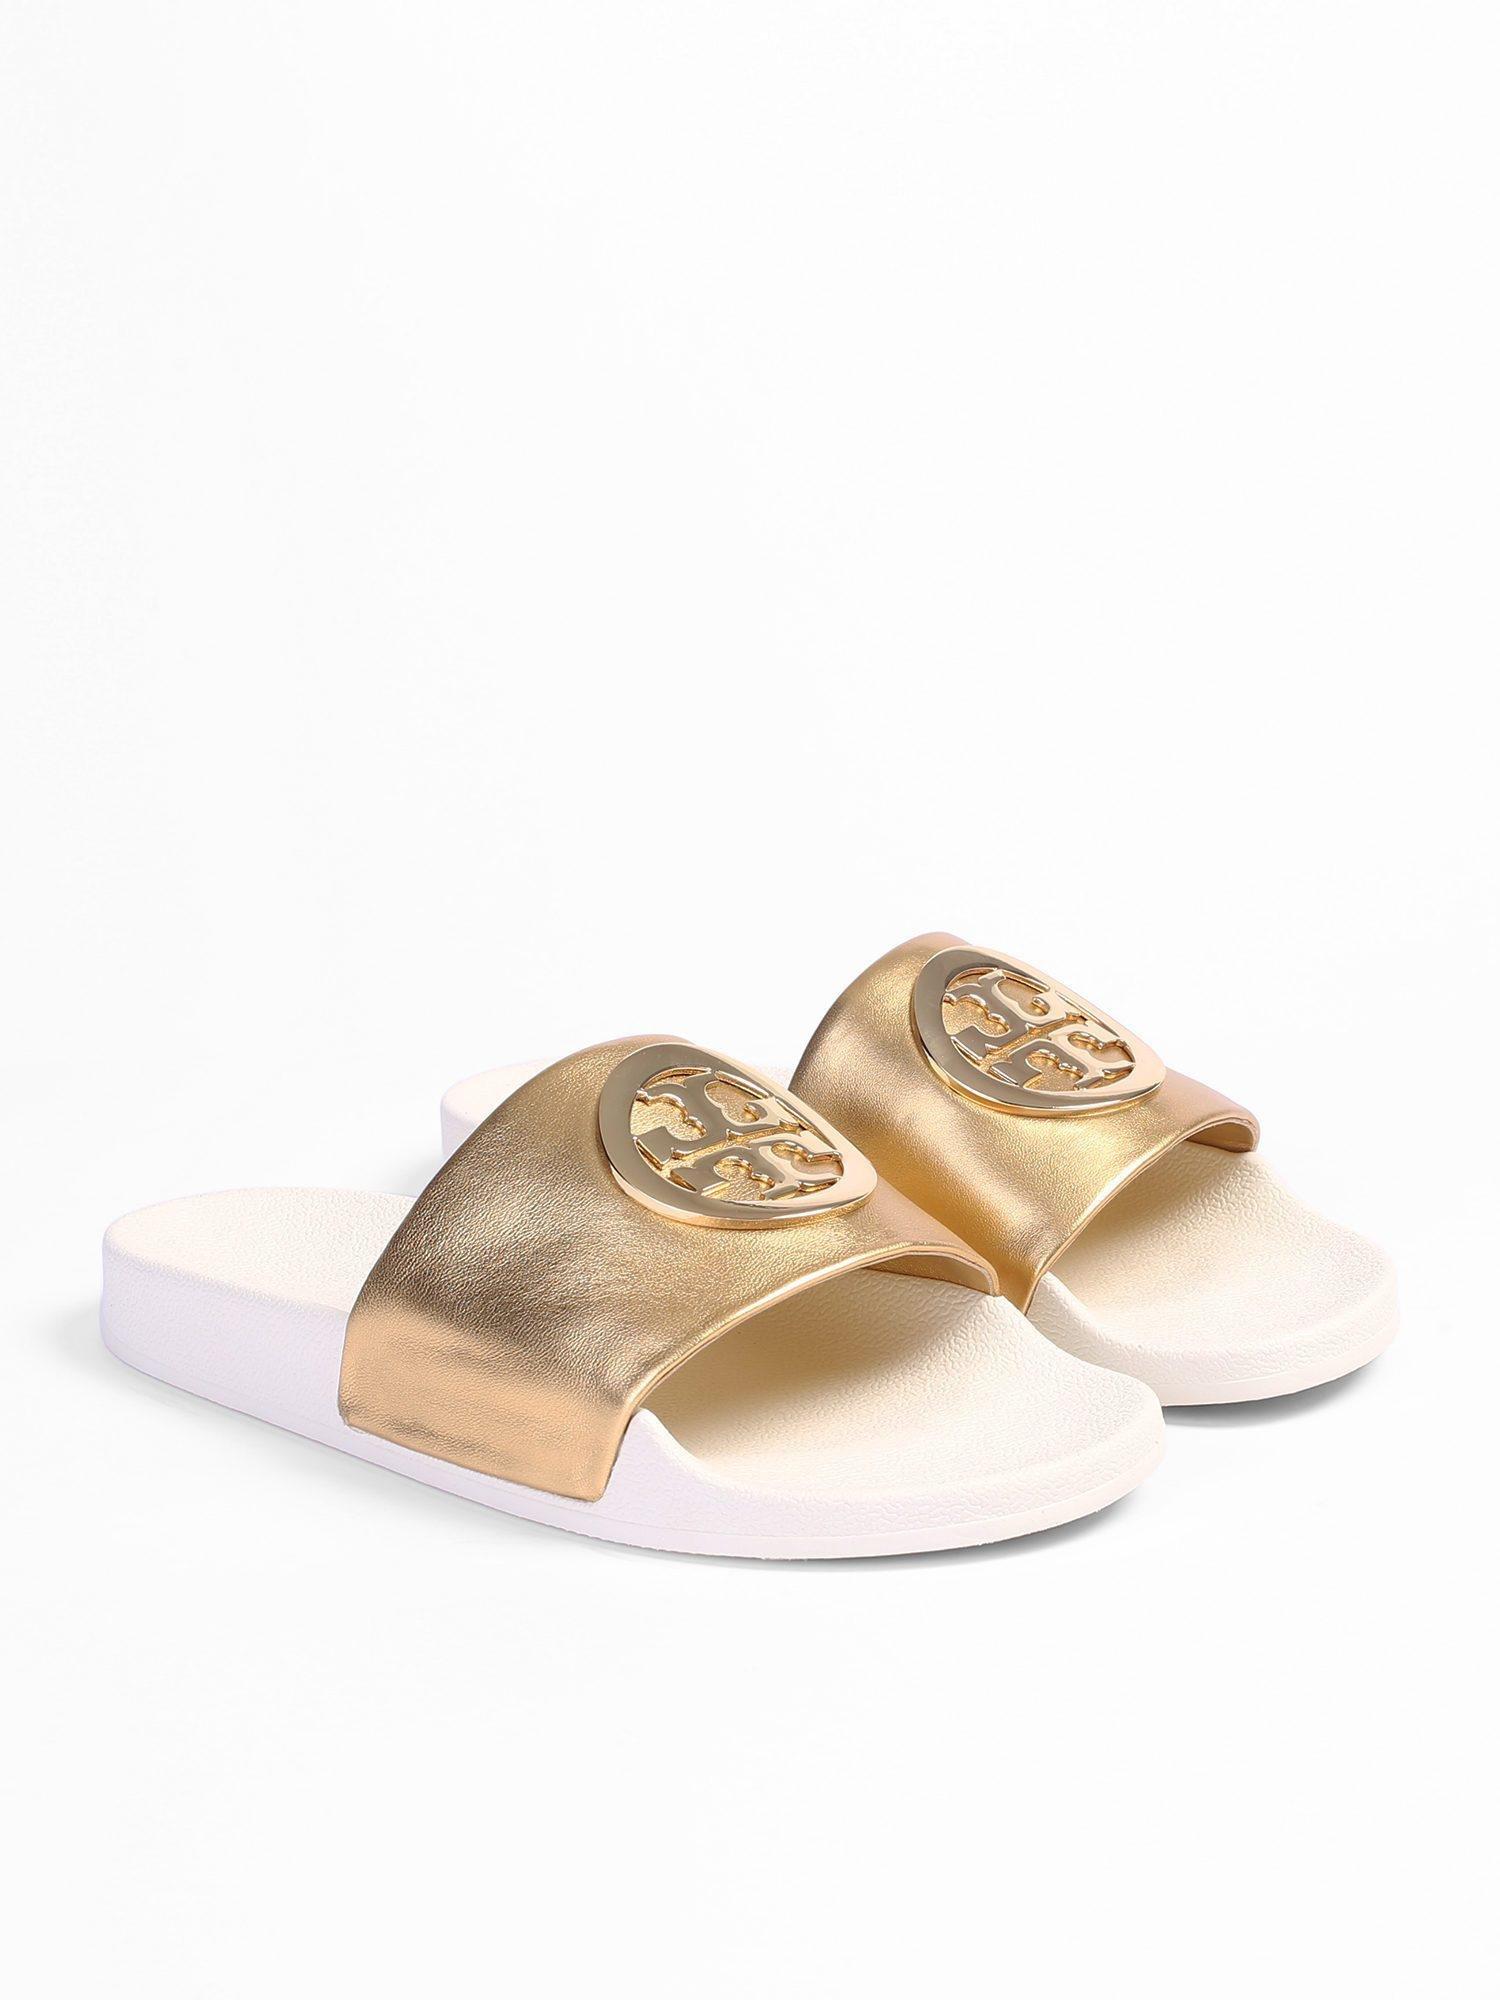 9bb1c57b280d Tory Burch - Lina Metallic Logo Slide Sandals - Lyst. View fullscreen